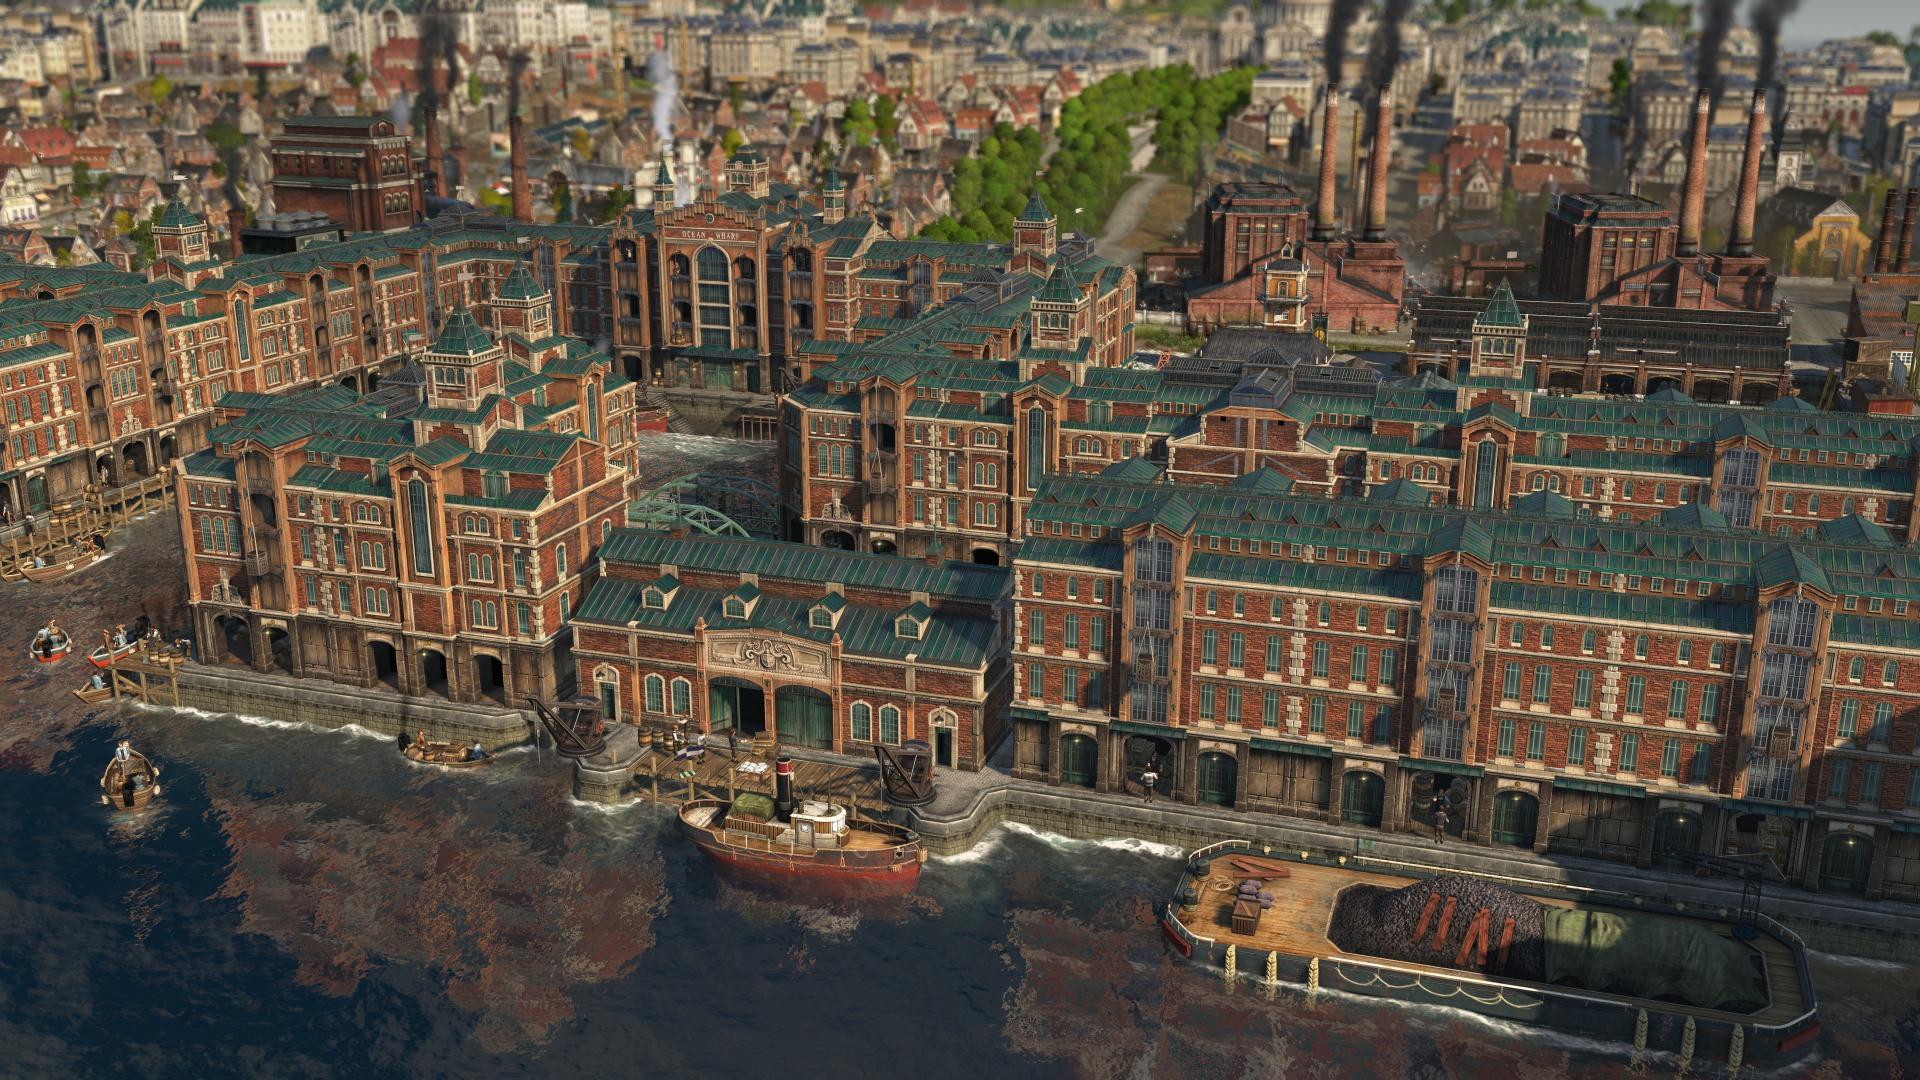 Anno1800_DLC7_Docklands_Screenshot_7-495116033a0dc658a65.56419895.jpg